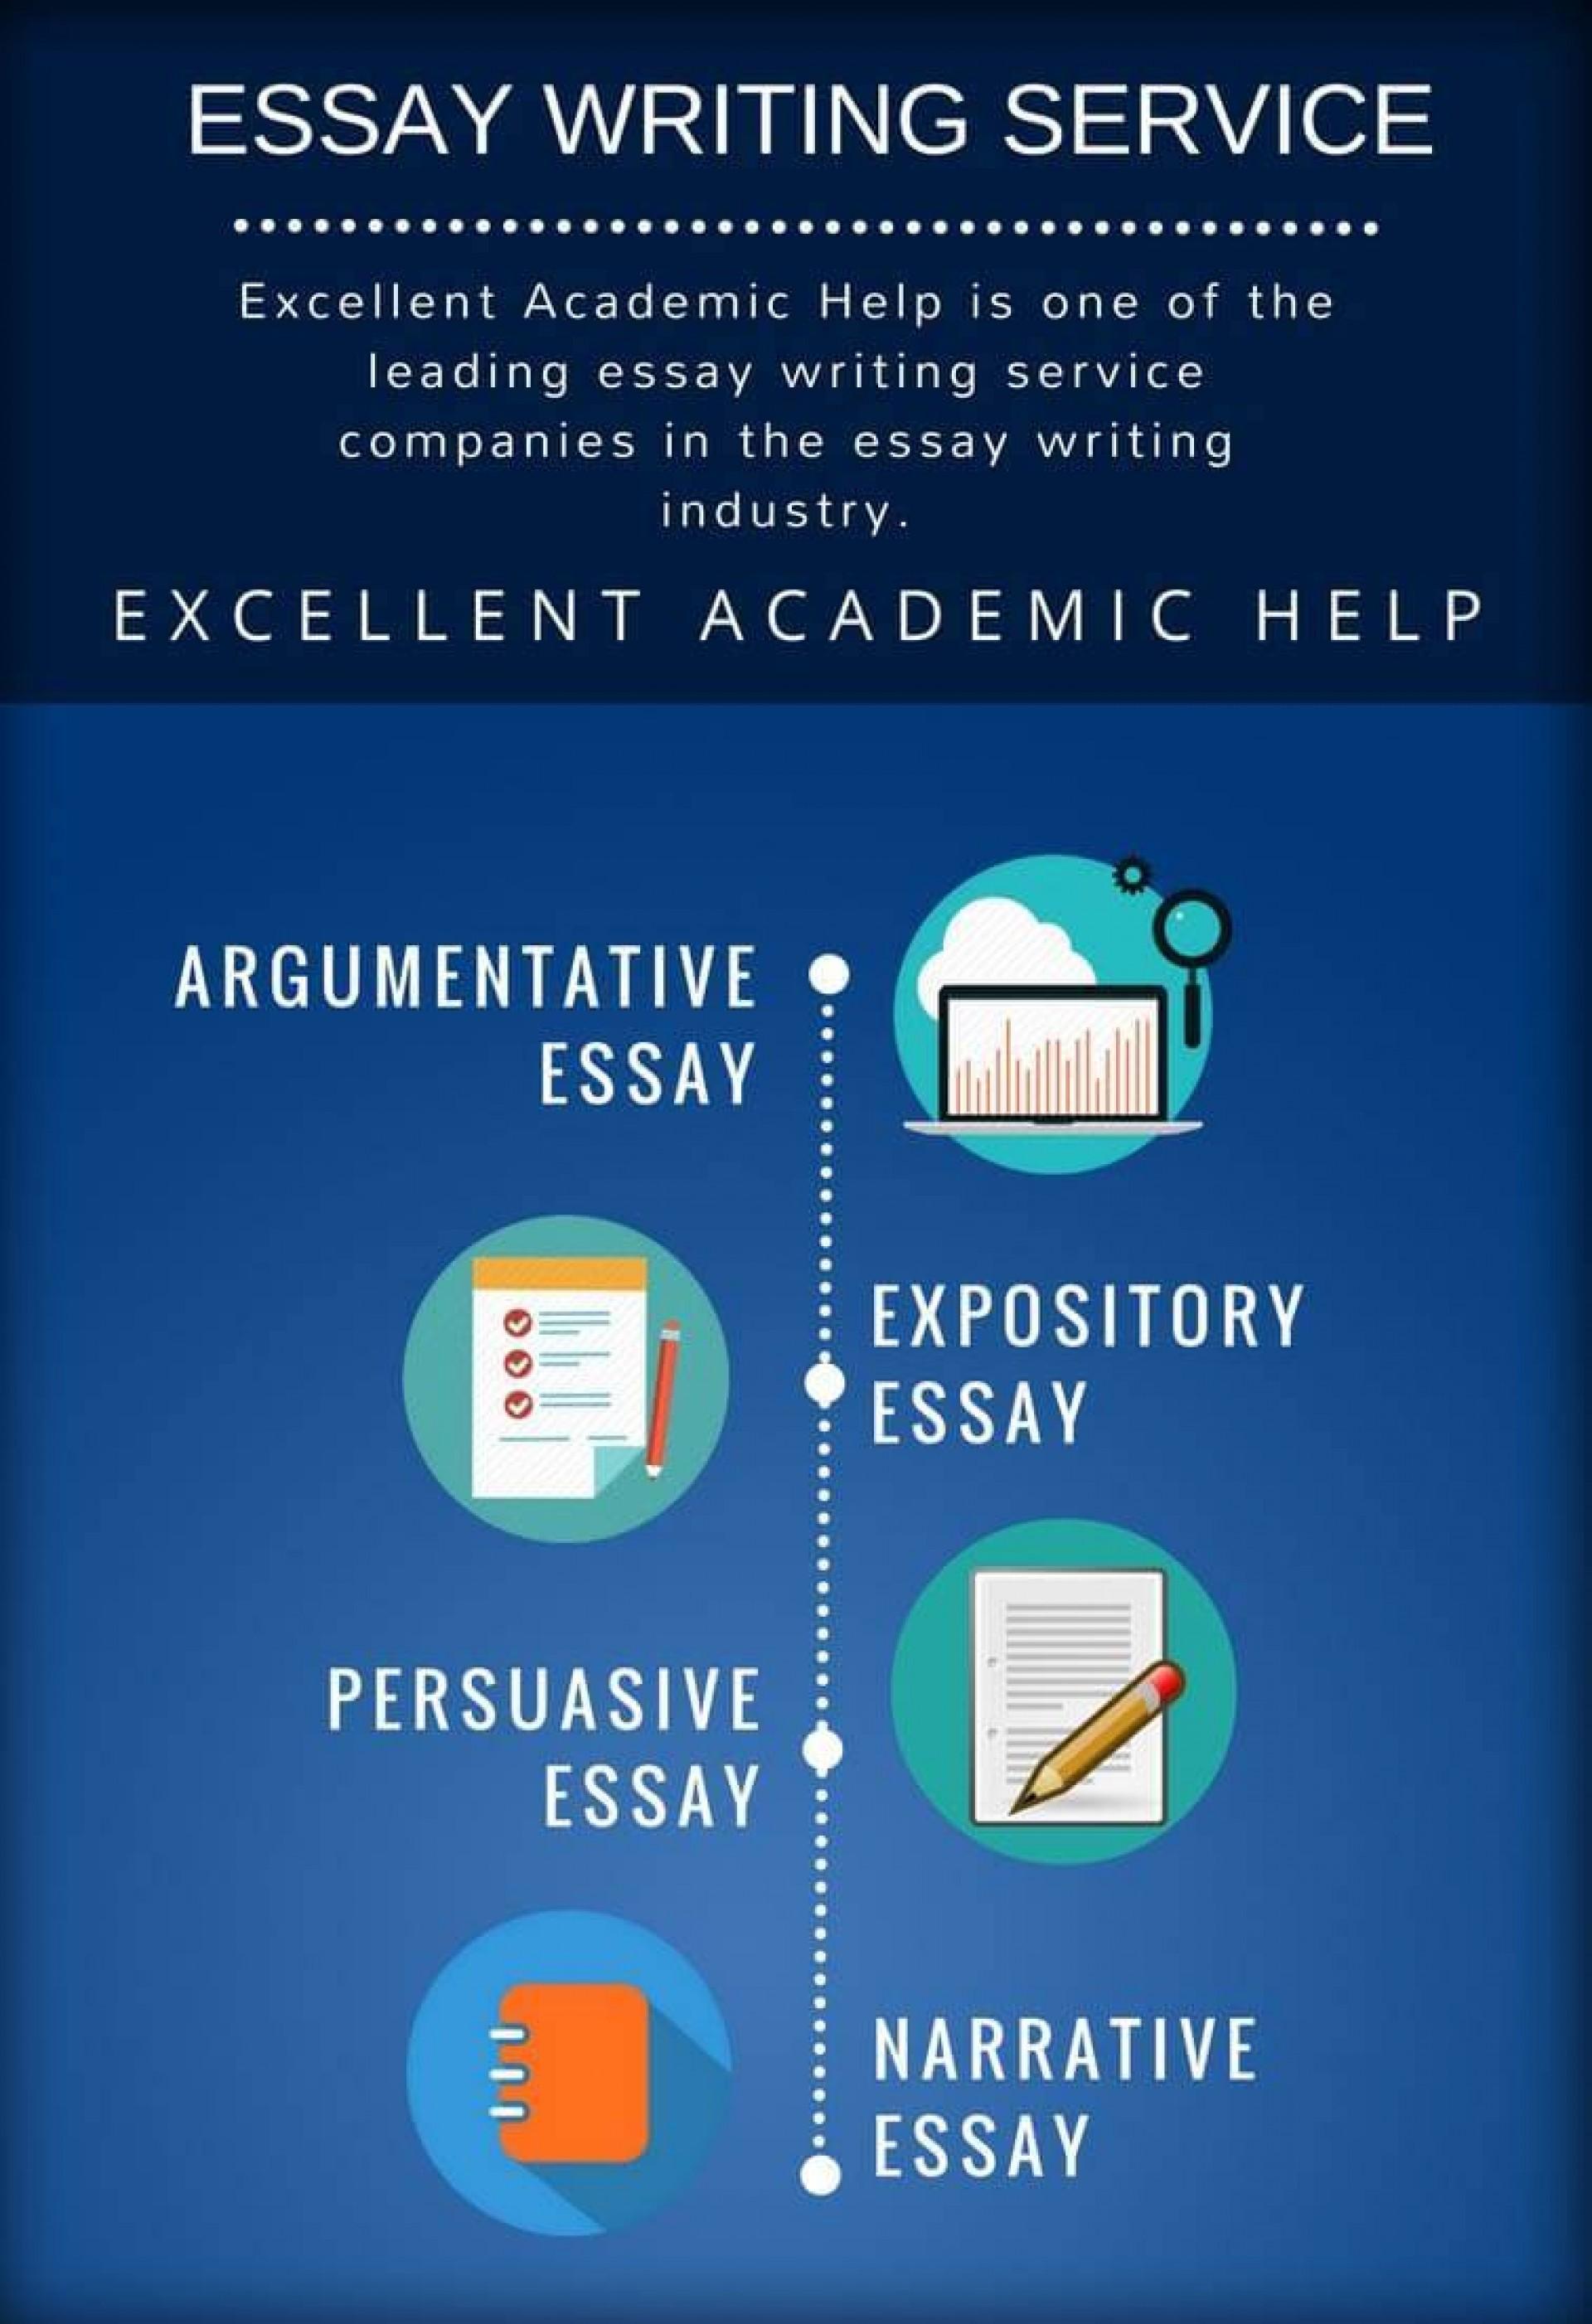 017 Cheap Essays Essay Writing Servicefit7562c1104 Beautiful Quick Uk Paper 1920